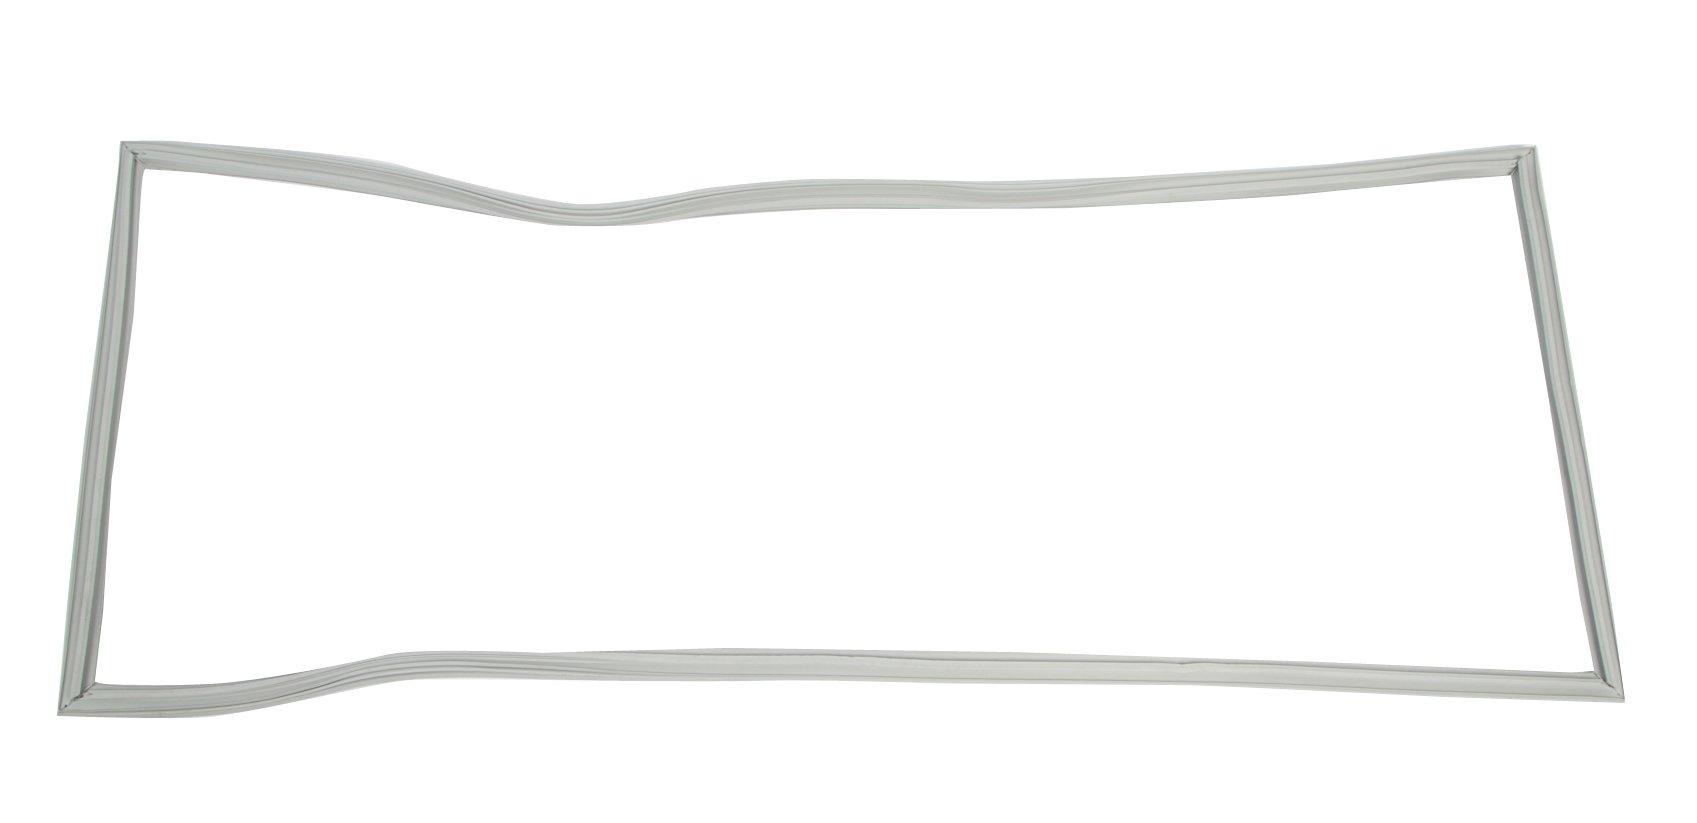 DELFIELD 1702796 Full Stainless Steel Door Gasket 6000Xl For Edgemount Style Hinging